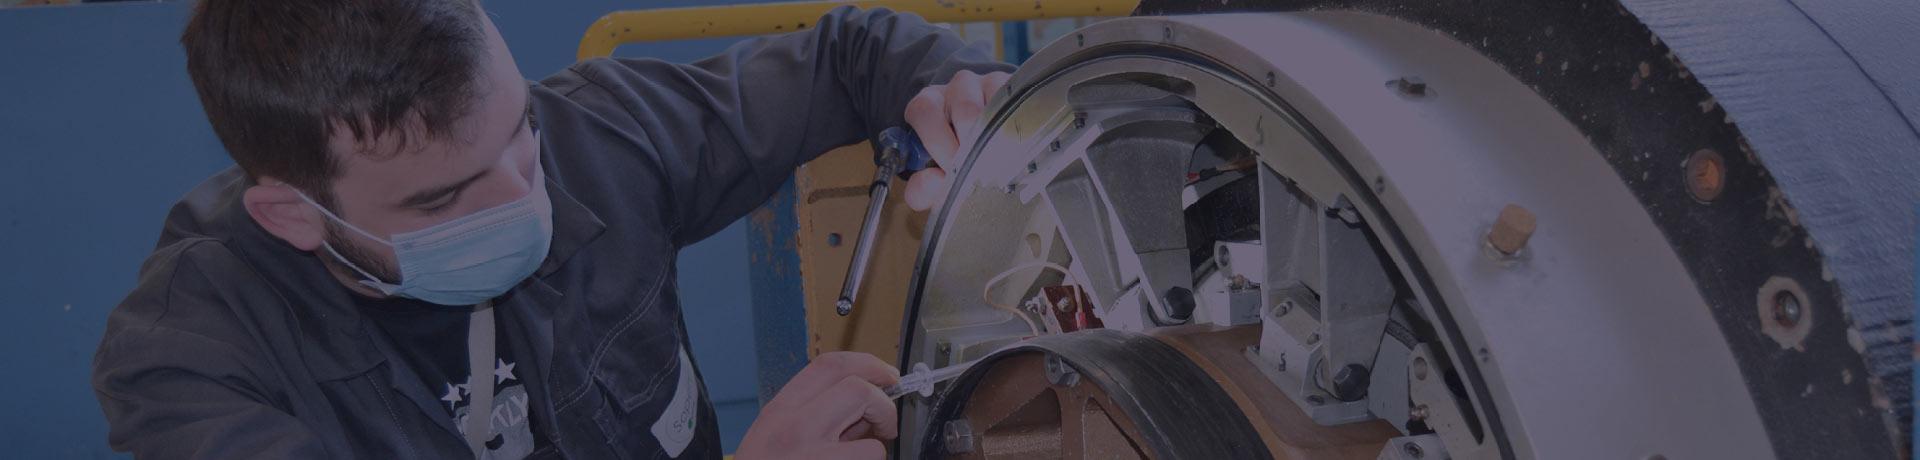 A man performs a maintenance operation on an equipment